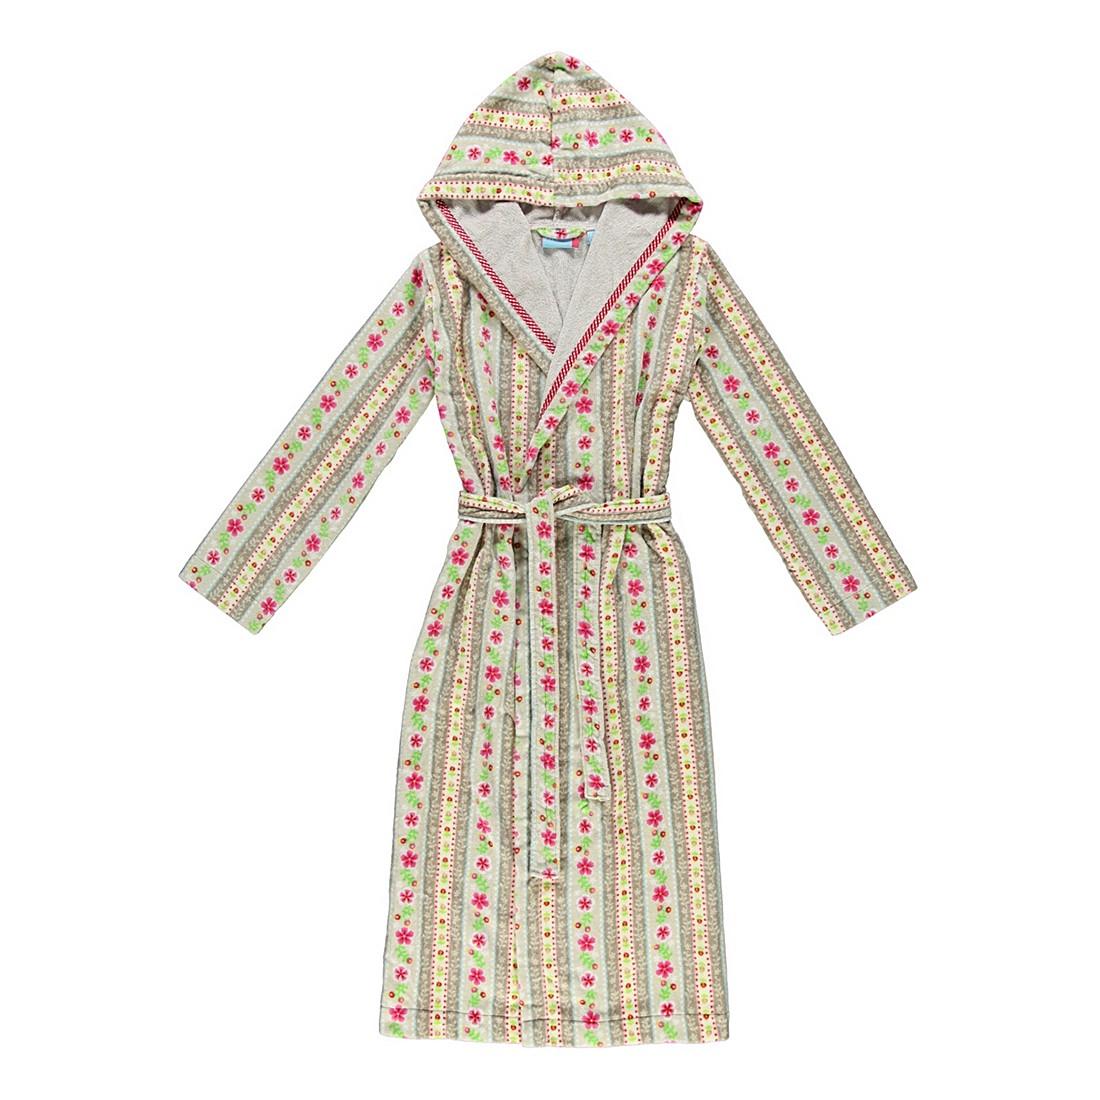 Bademantel Cute Ribbon – Damen – Velours – 100% Baumwolle Khaki – Größe: XS, PIP Studio bestellen